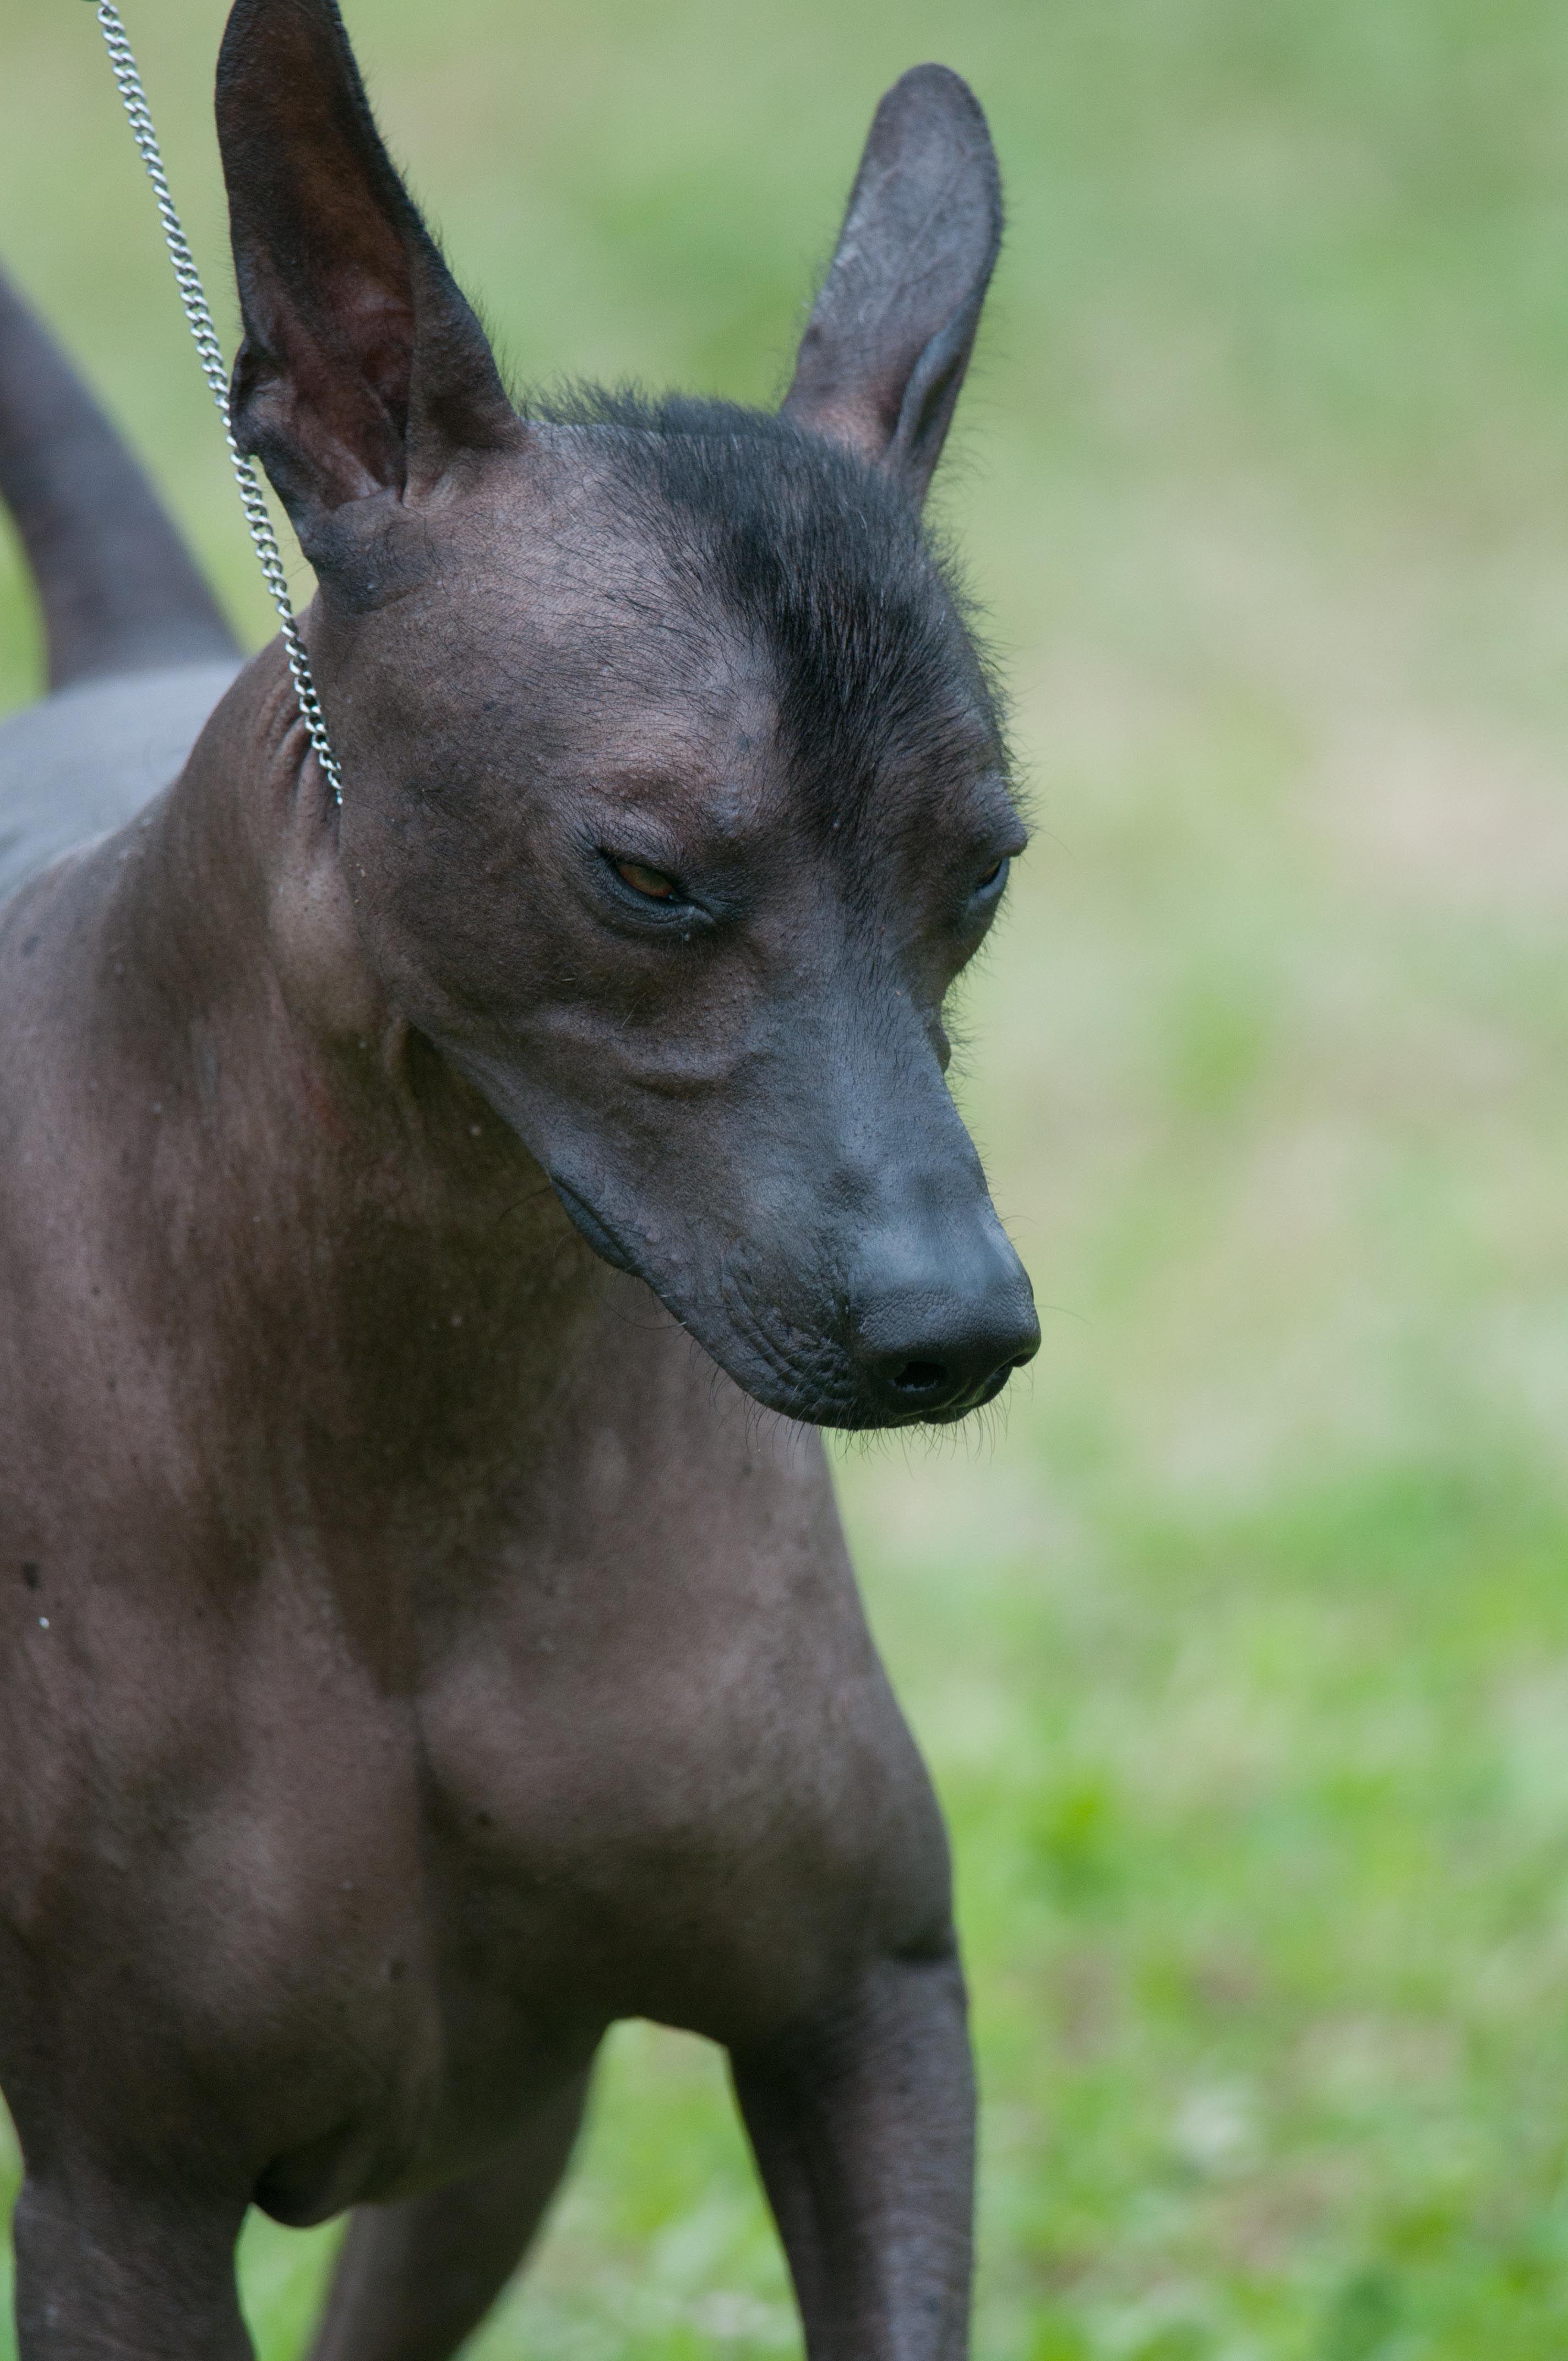 Xoloitzcuintli #Xoloitzcuintli | DOGS...